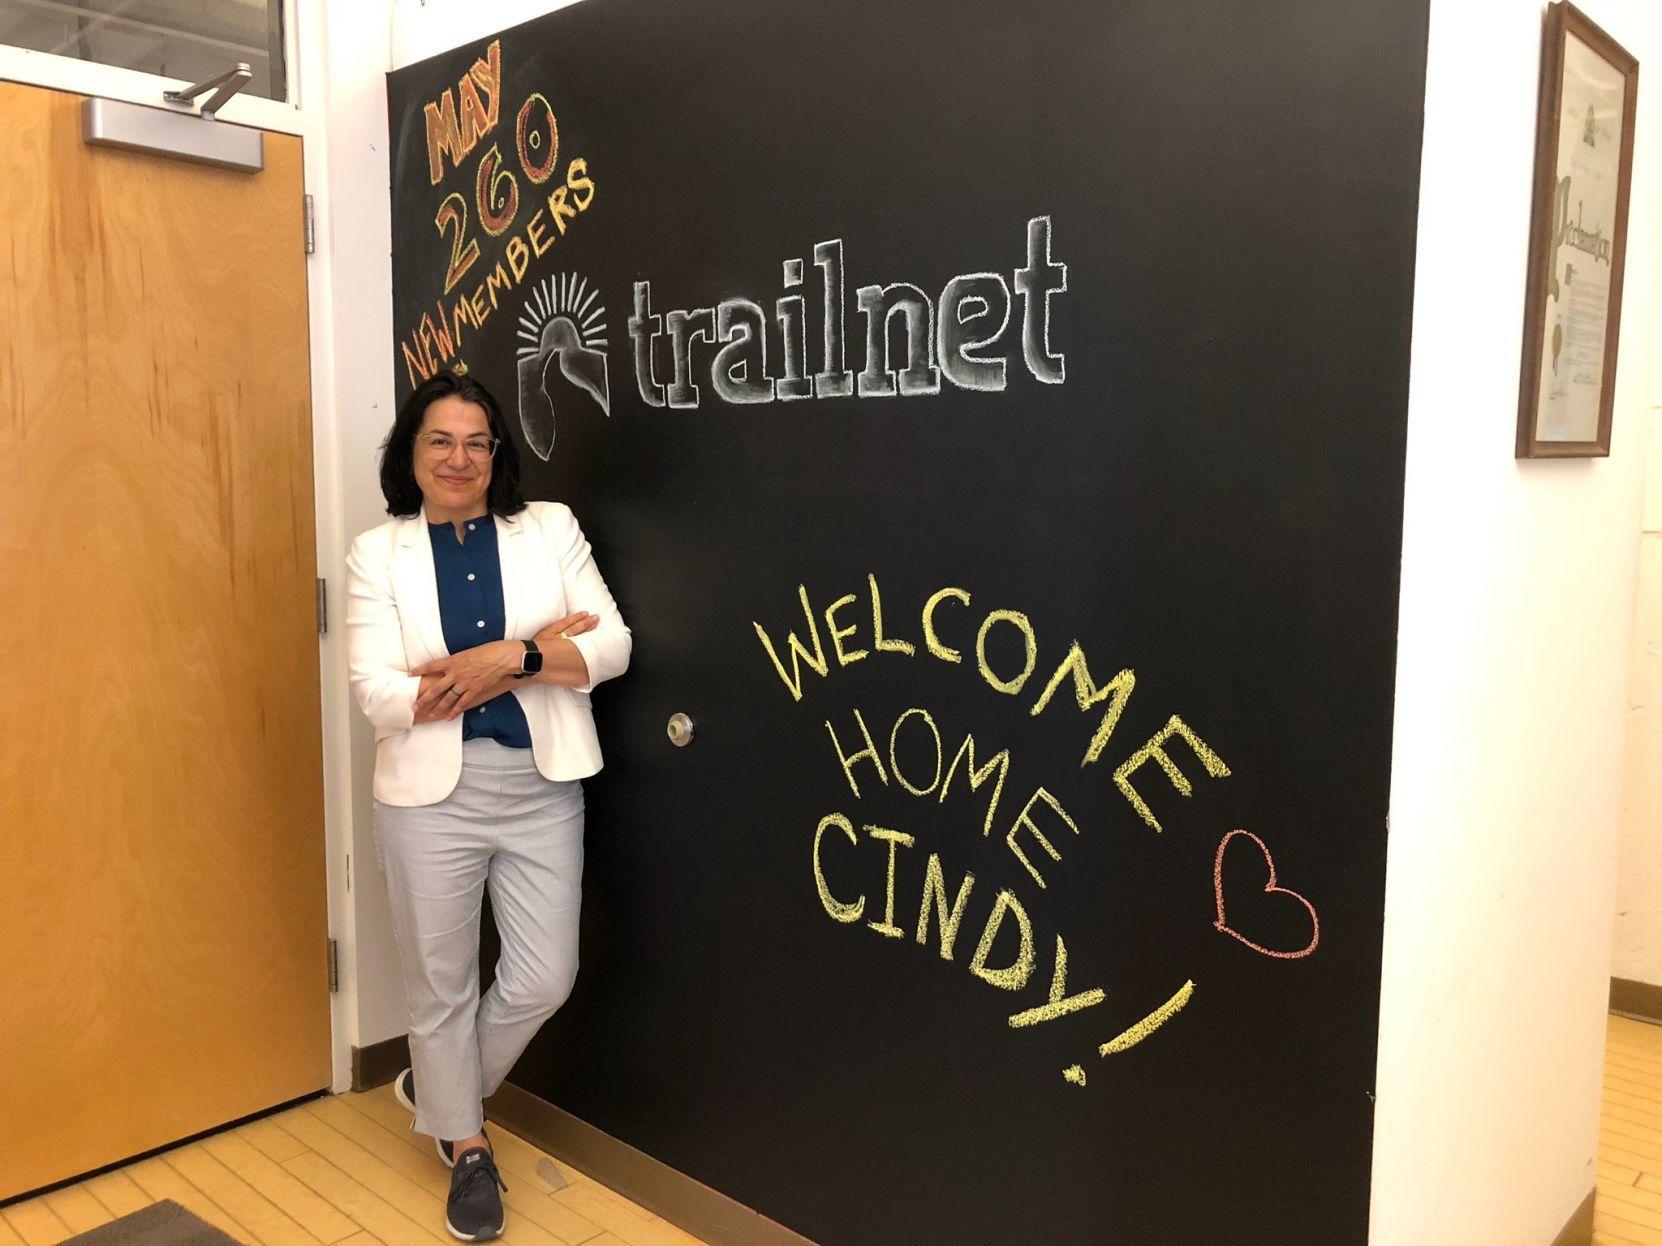 Trailnet CEO Cindy Mense